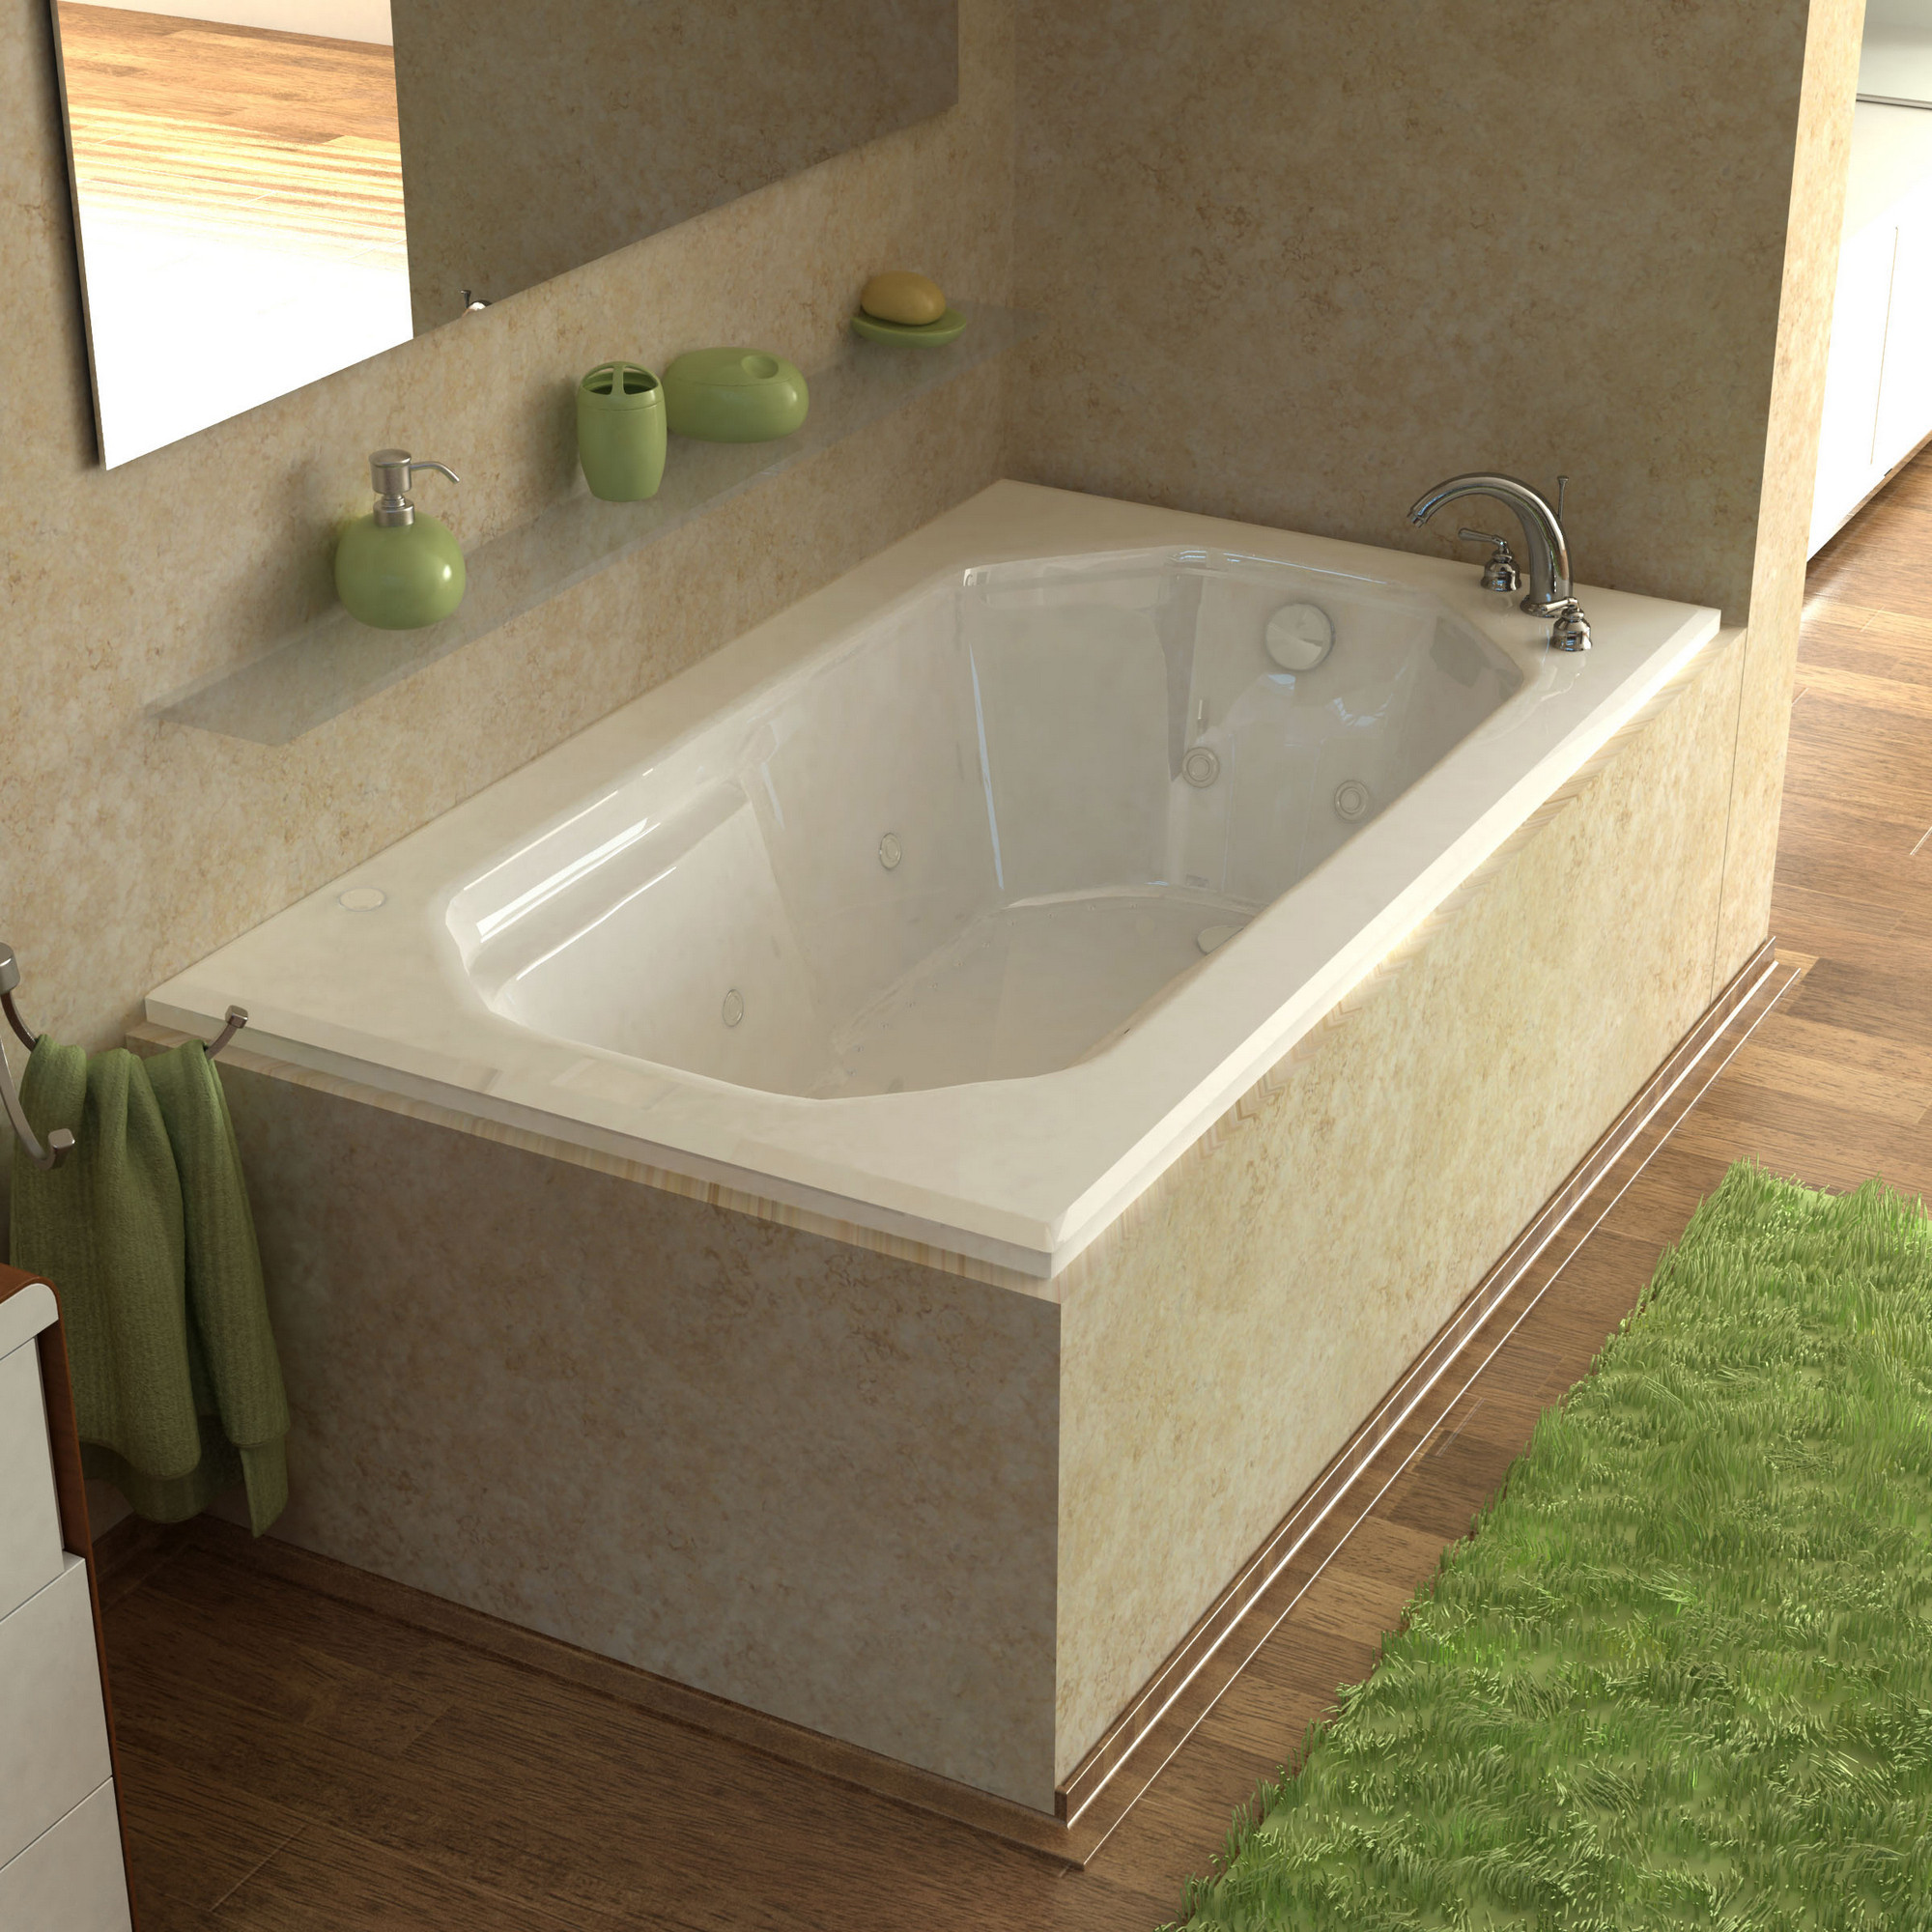 MediTub 3660MDL Atlantis Mirage Air & Whirlpool Bathtub With Left Drain